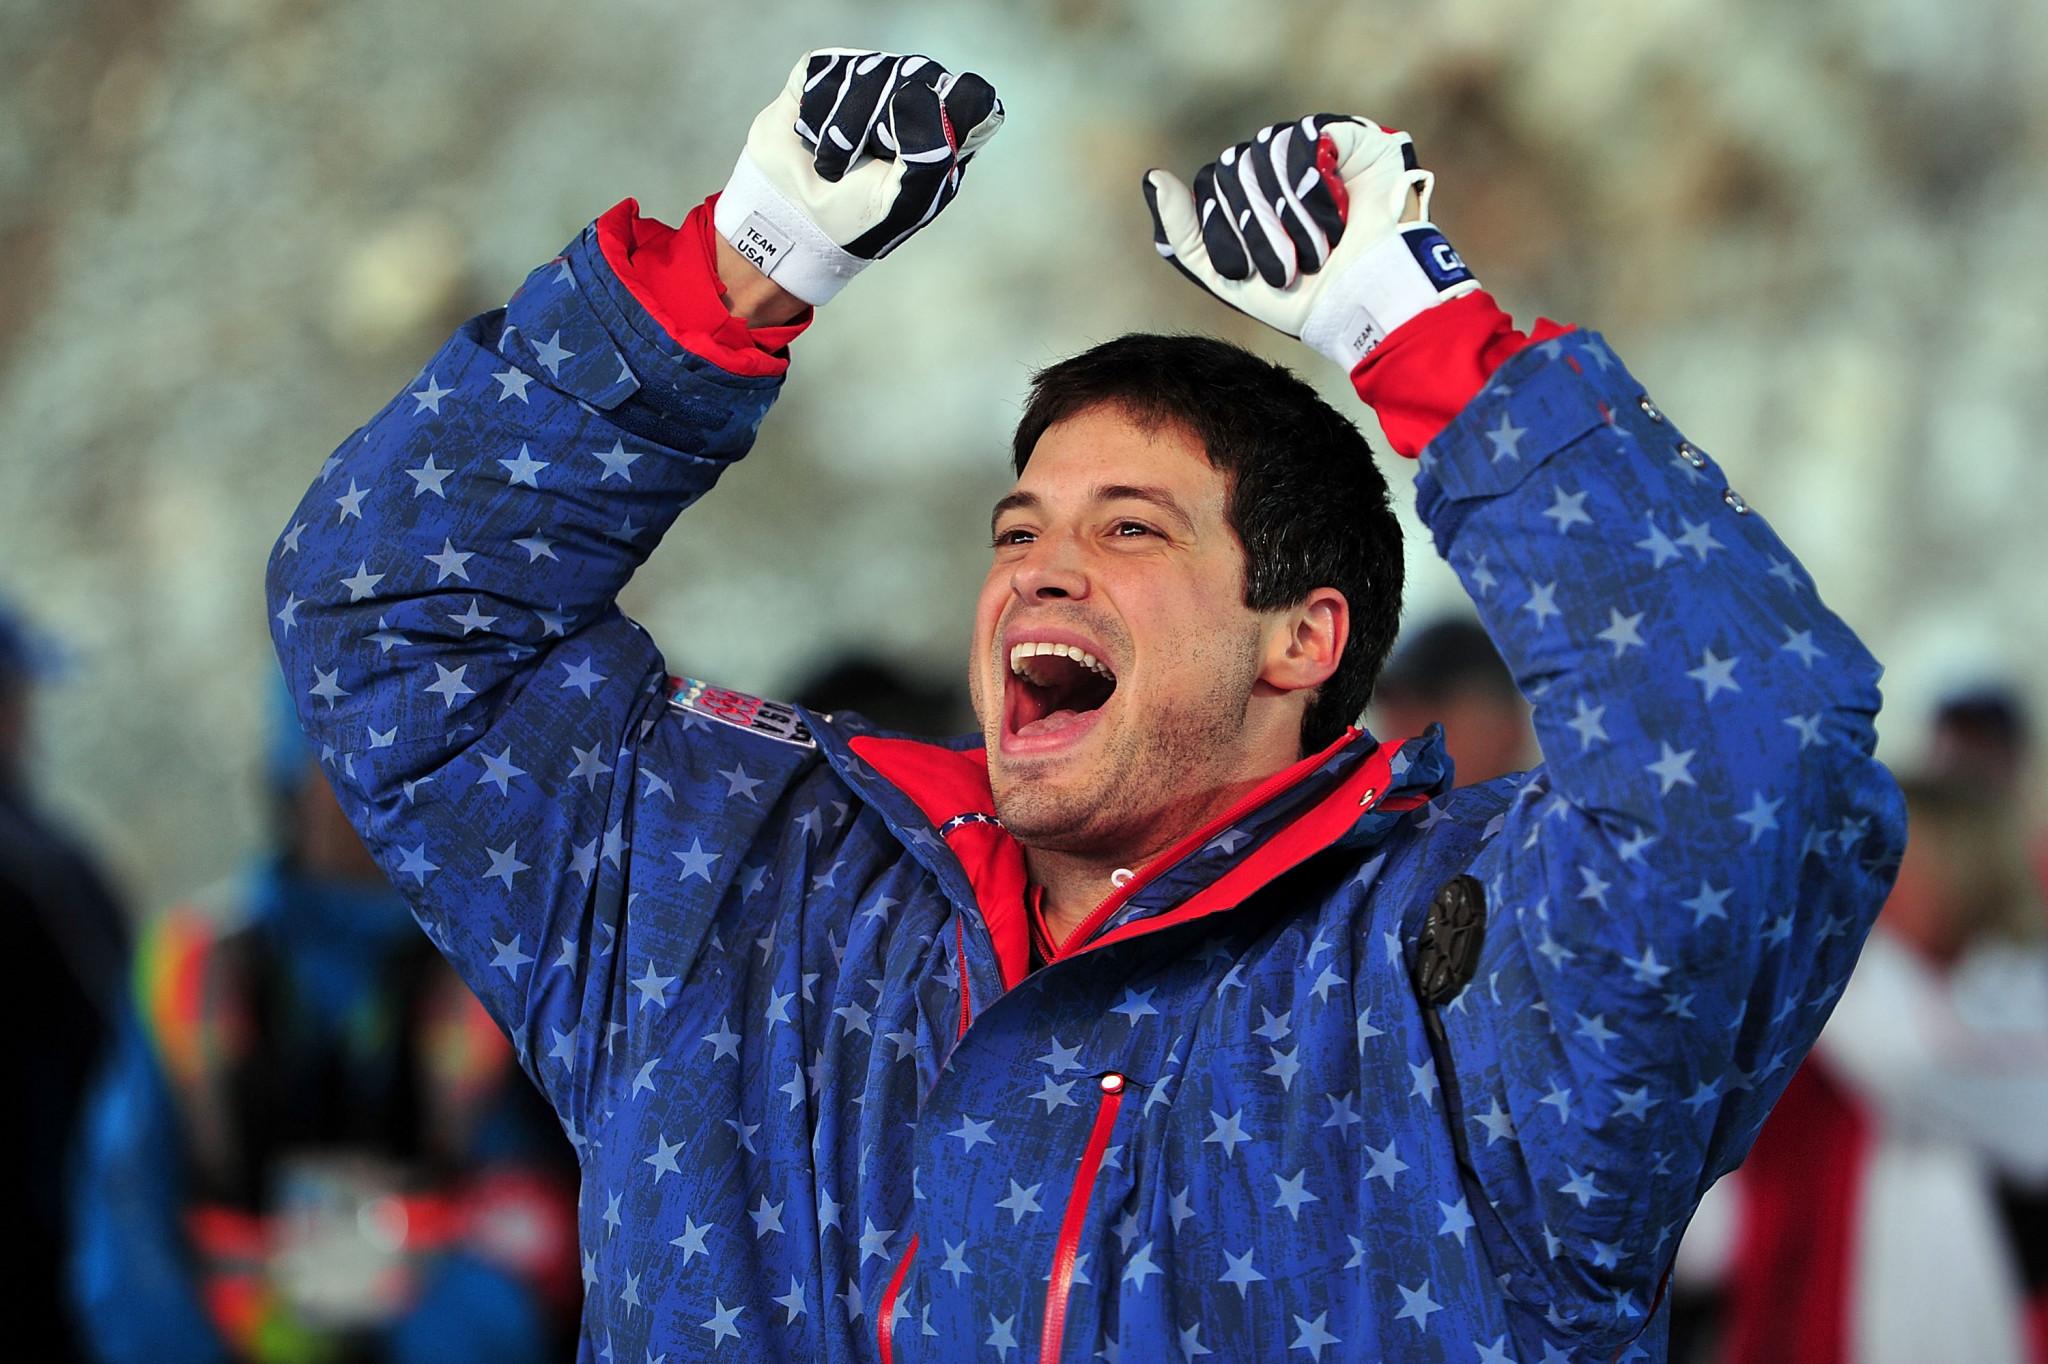 Mesler among latest entrants to USA Bobsled and Skeleton Hall of Fame